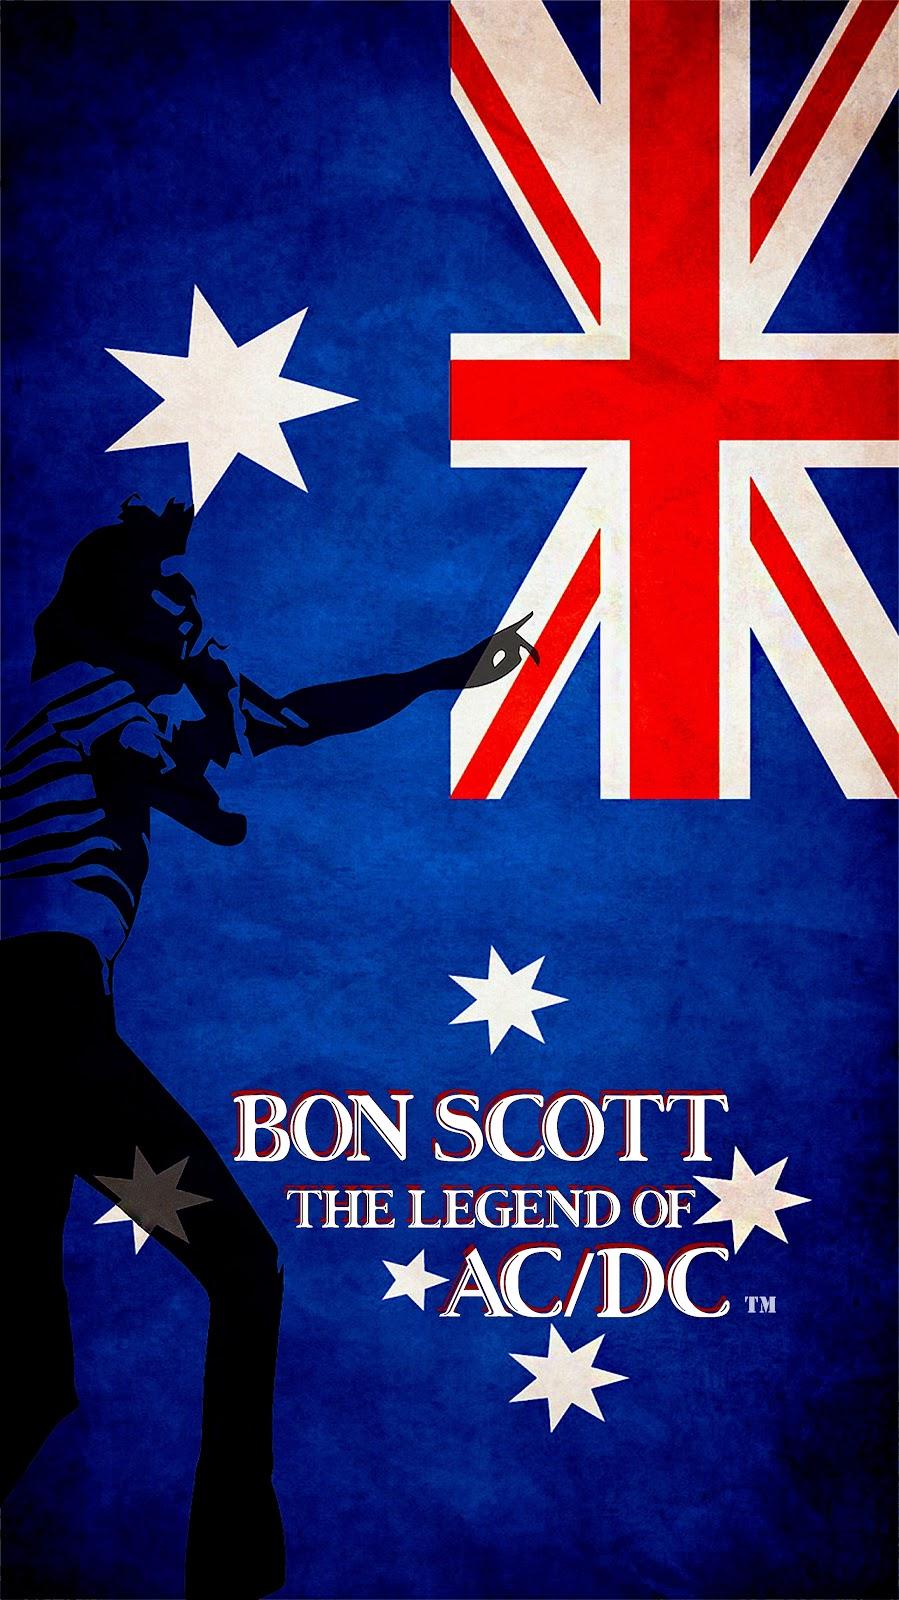 bon scott the legend of ac dc unauthorised bon scott film seeks production deal. Black Bedroom Furniture Sets. Home Design Ideas